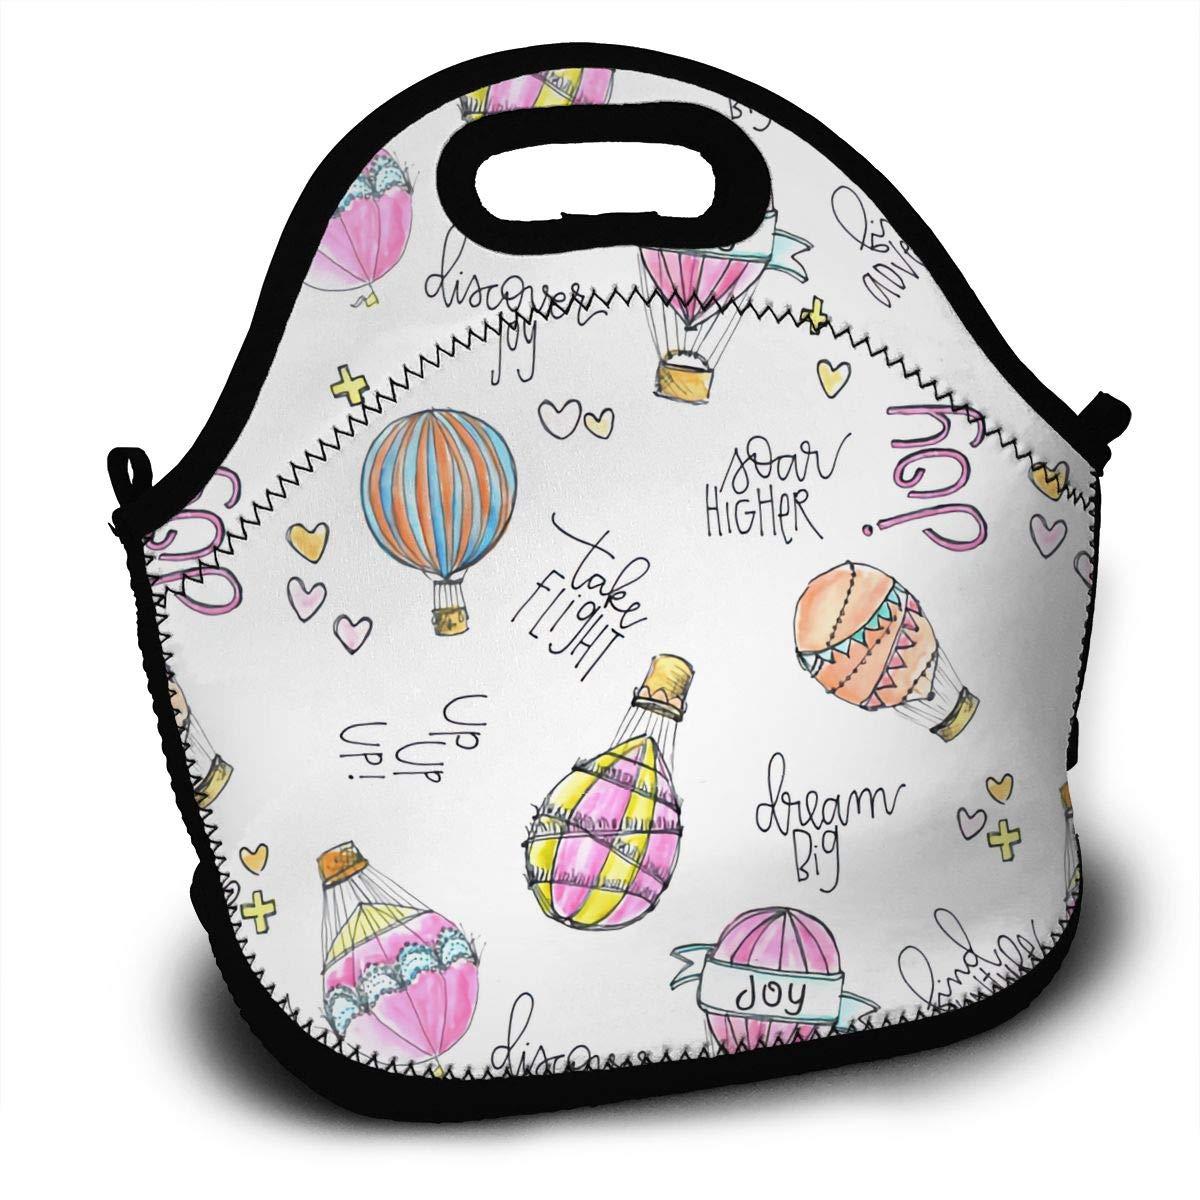 6fdecd21219f Amazon.com - YAIC ULI Character Balloon Portable Carry Insulated ...